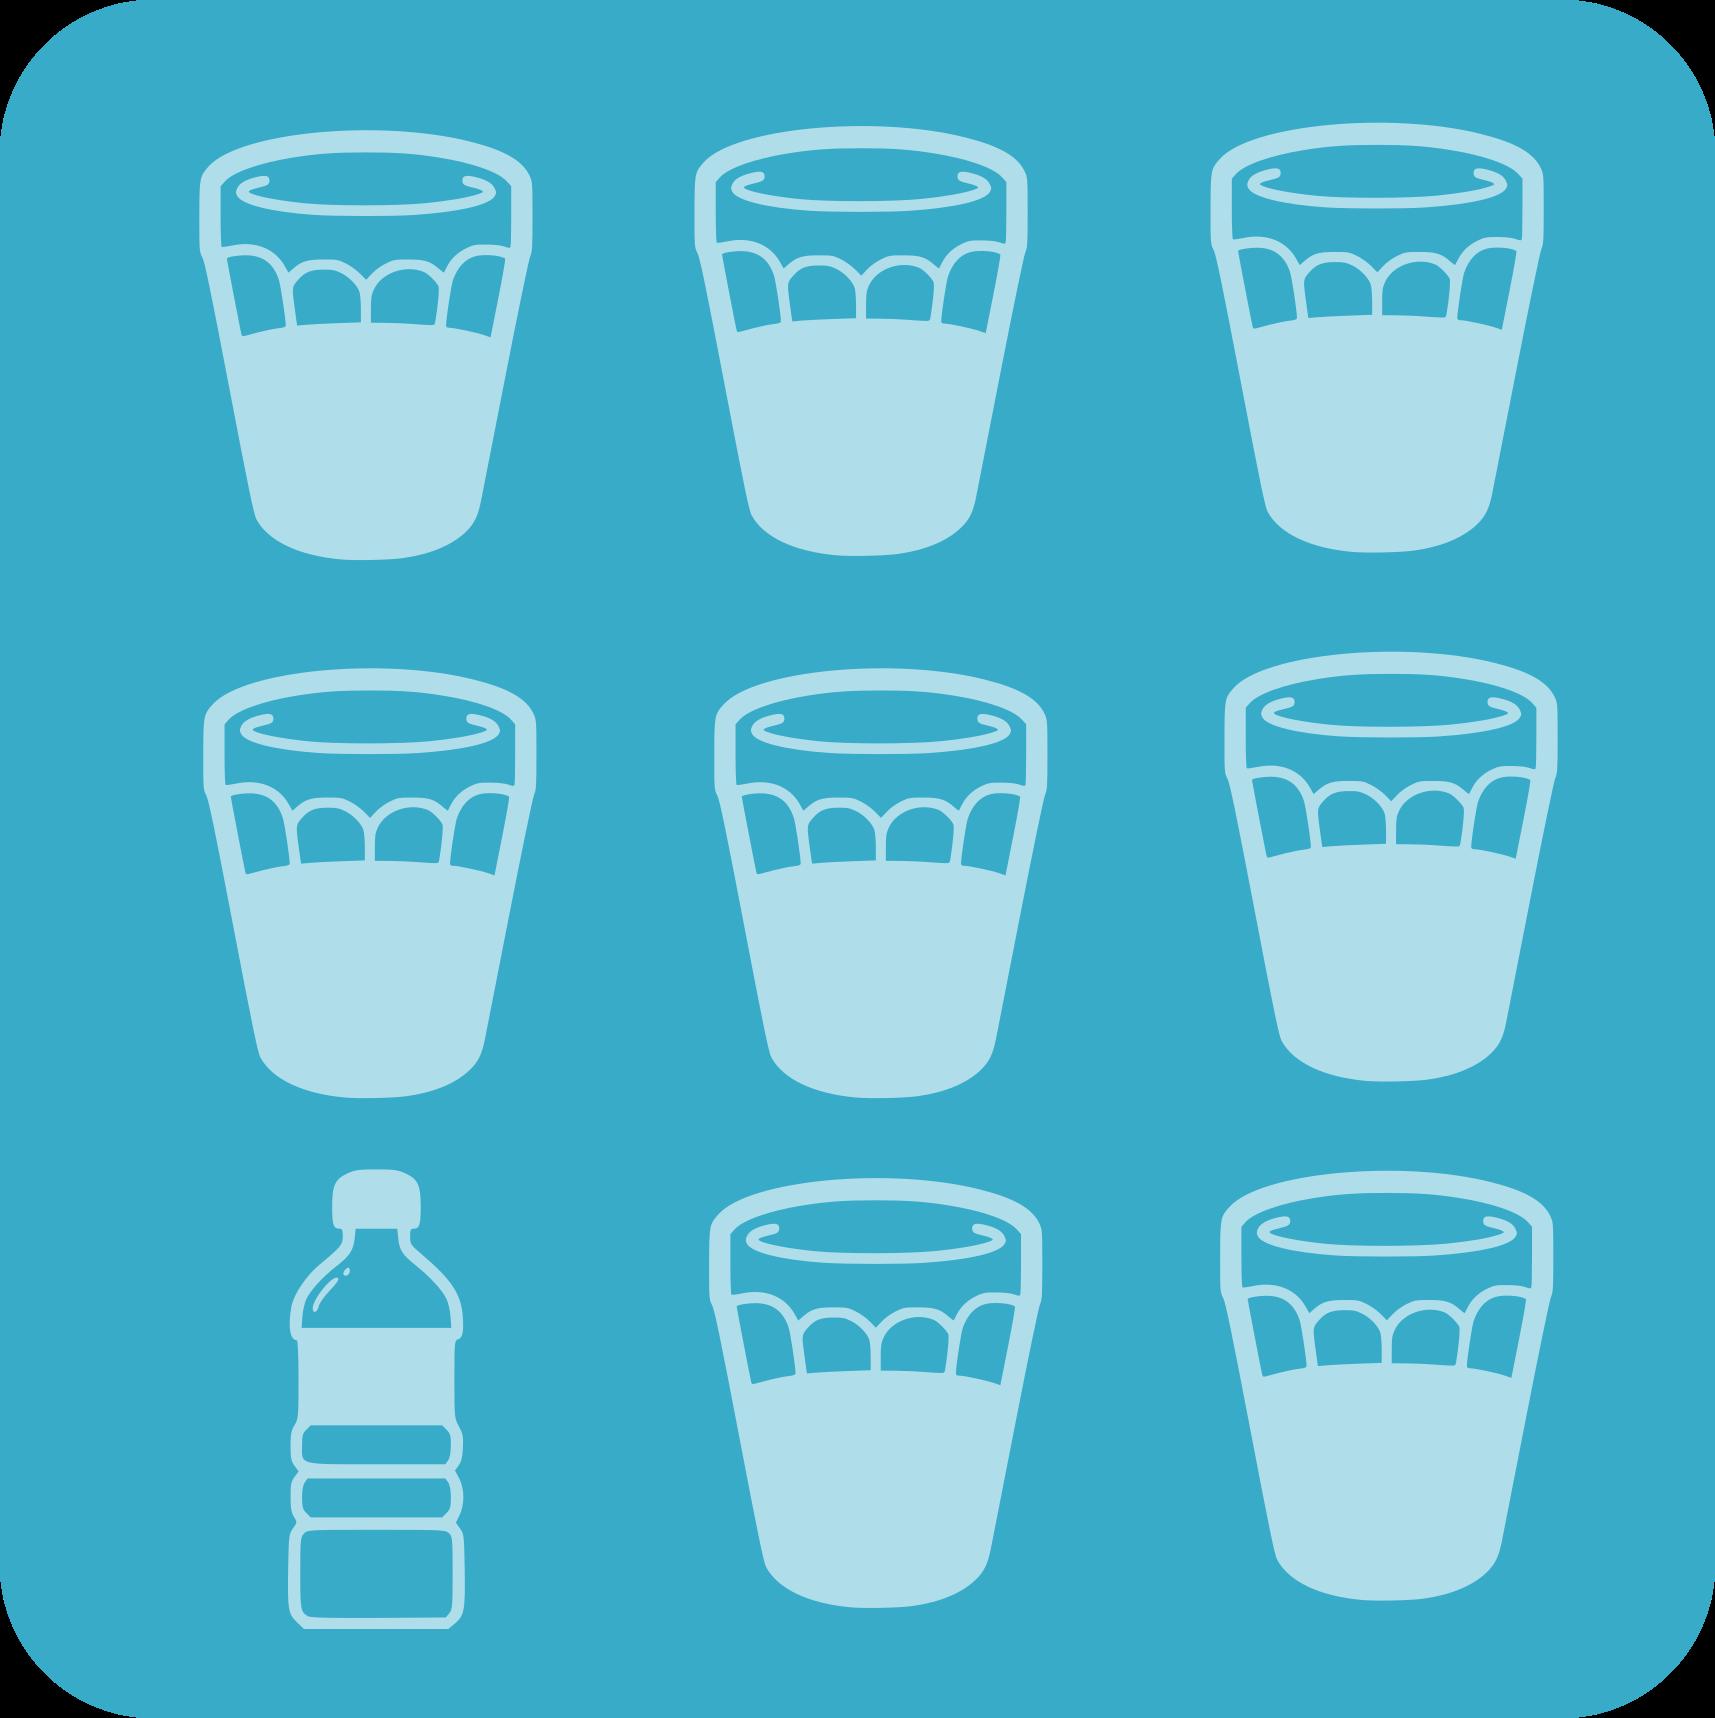 8 gots d'aigua